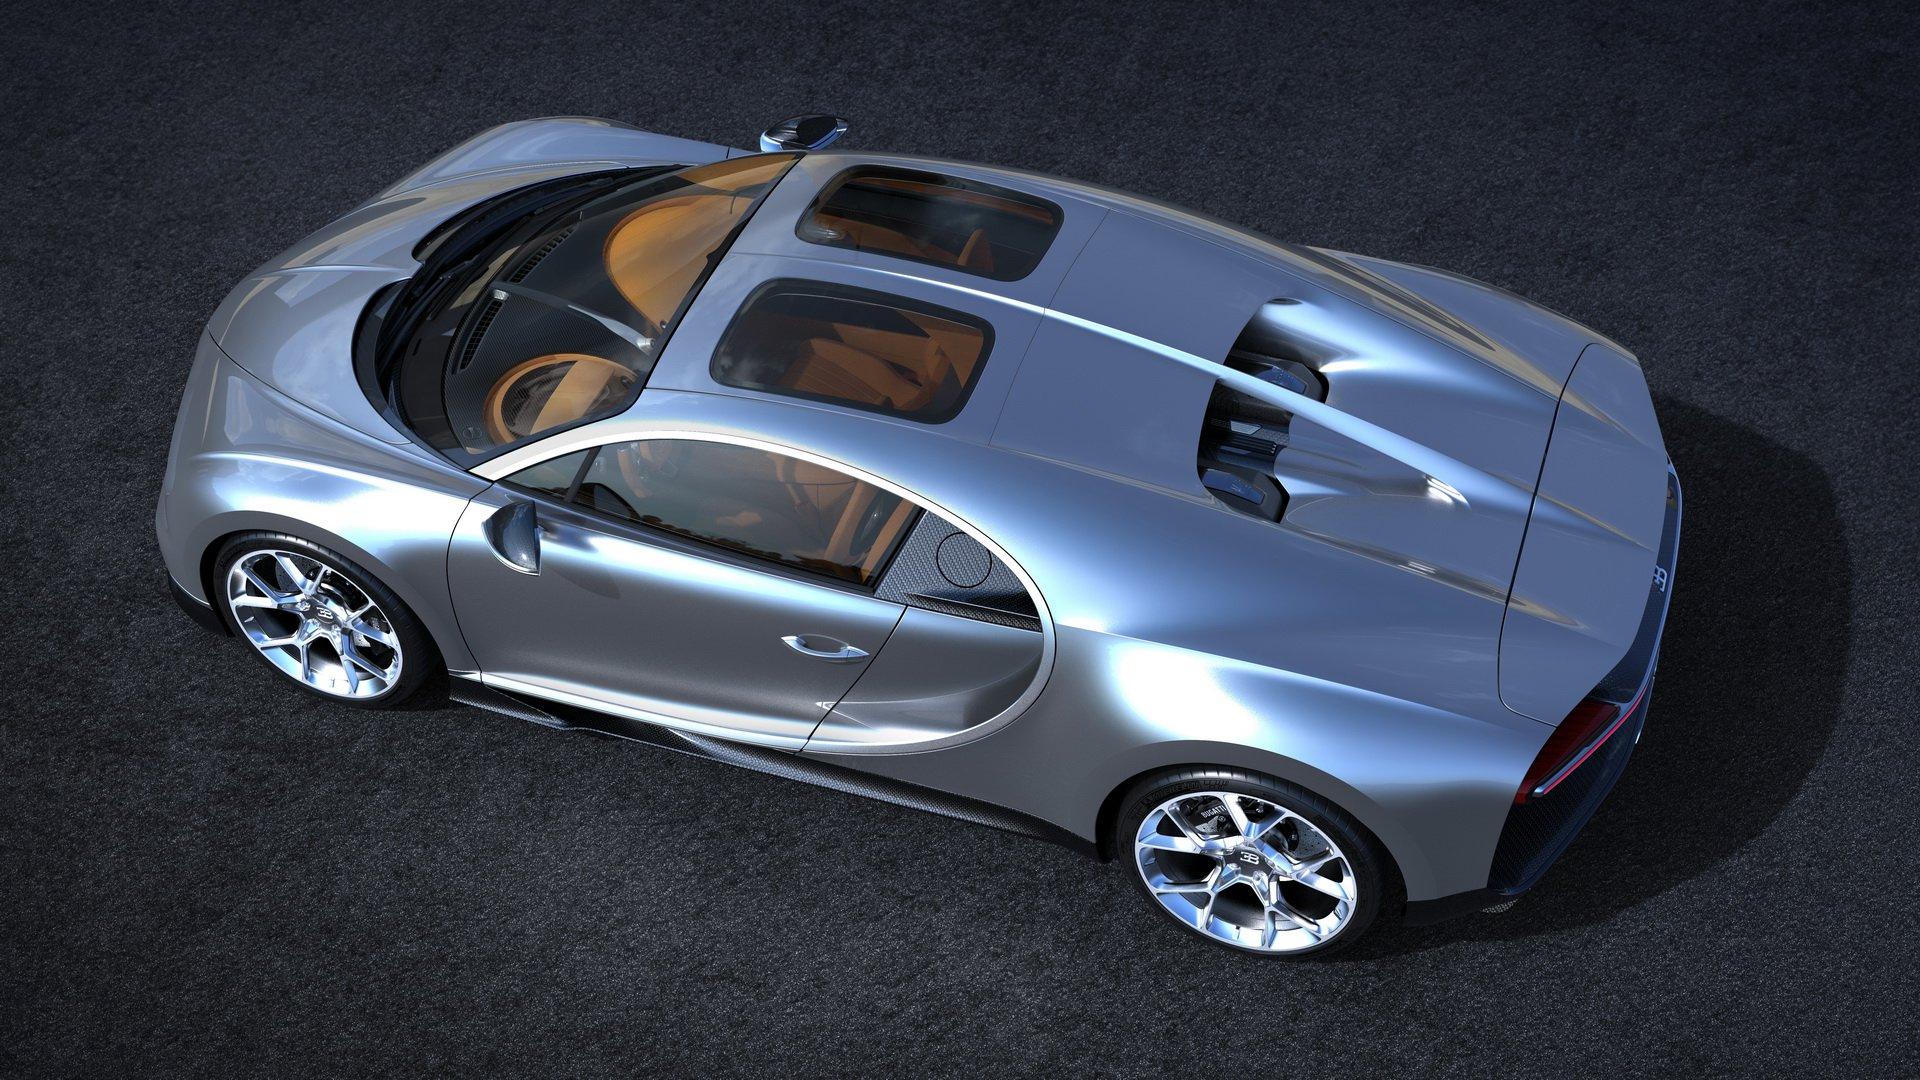 Bugatti Chiron Sky View glass roof (1)